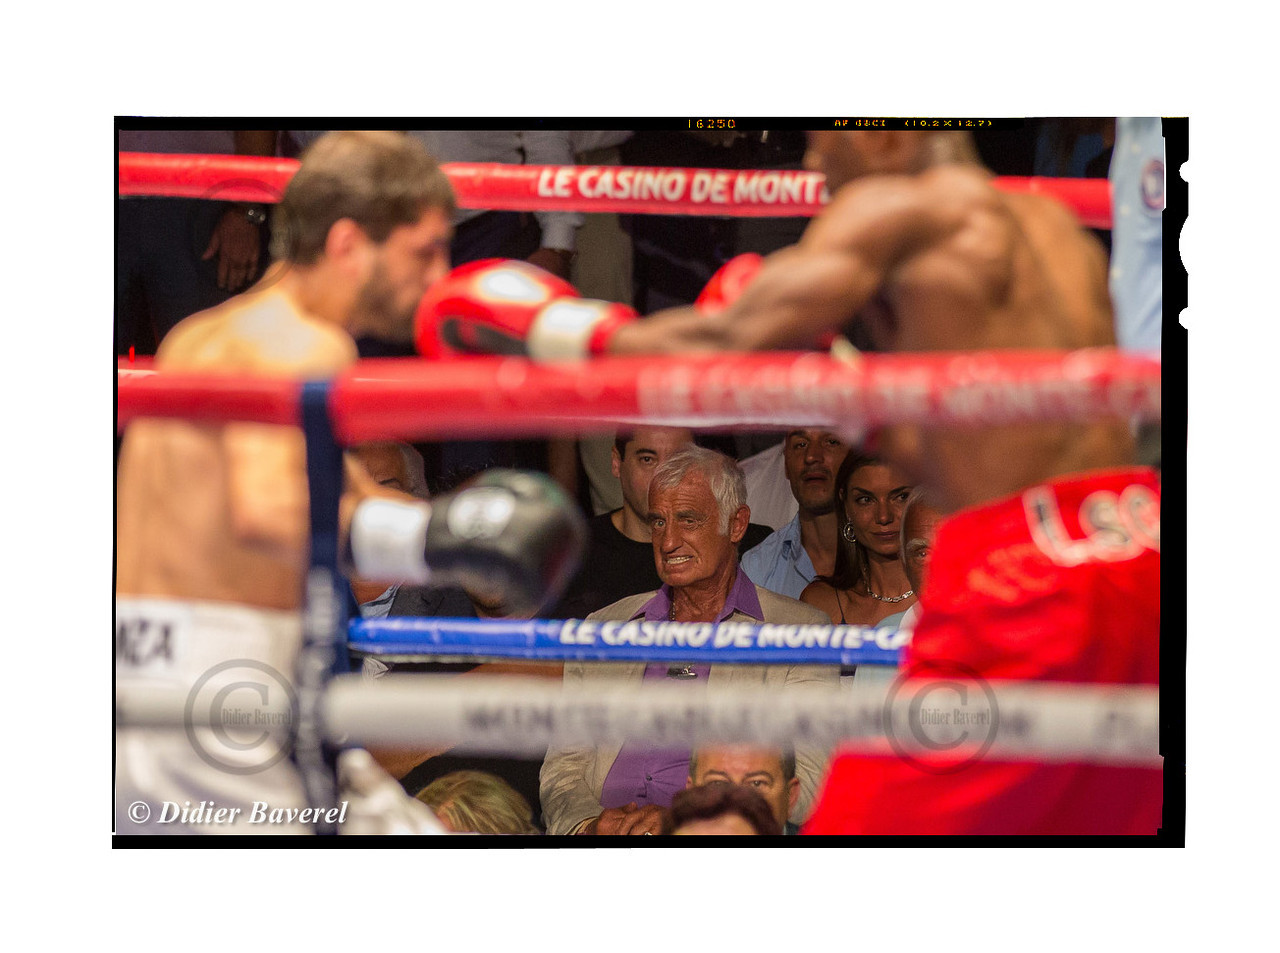 WBA/IBO Super Lightweight Match In Monte-Carlo